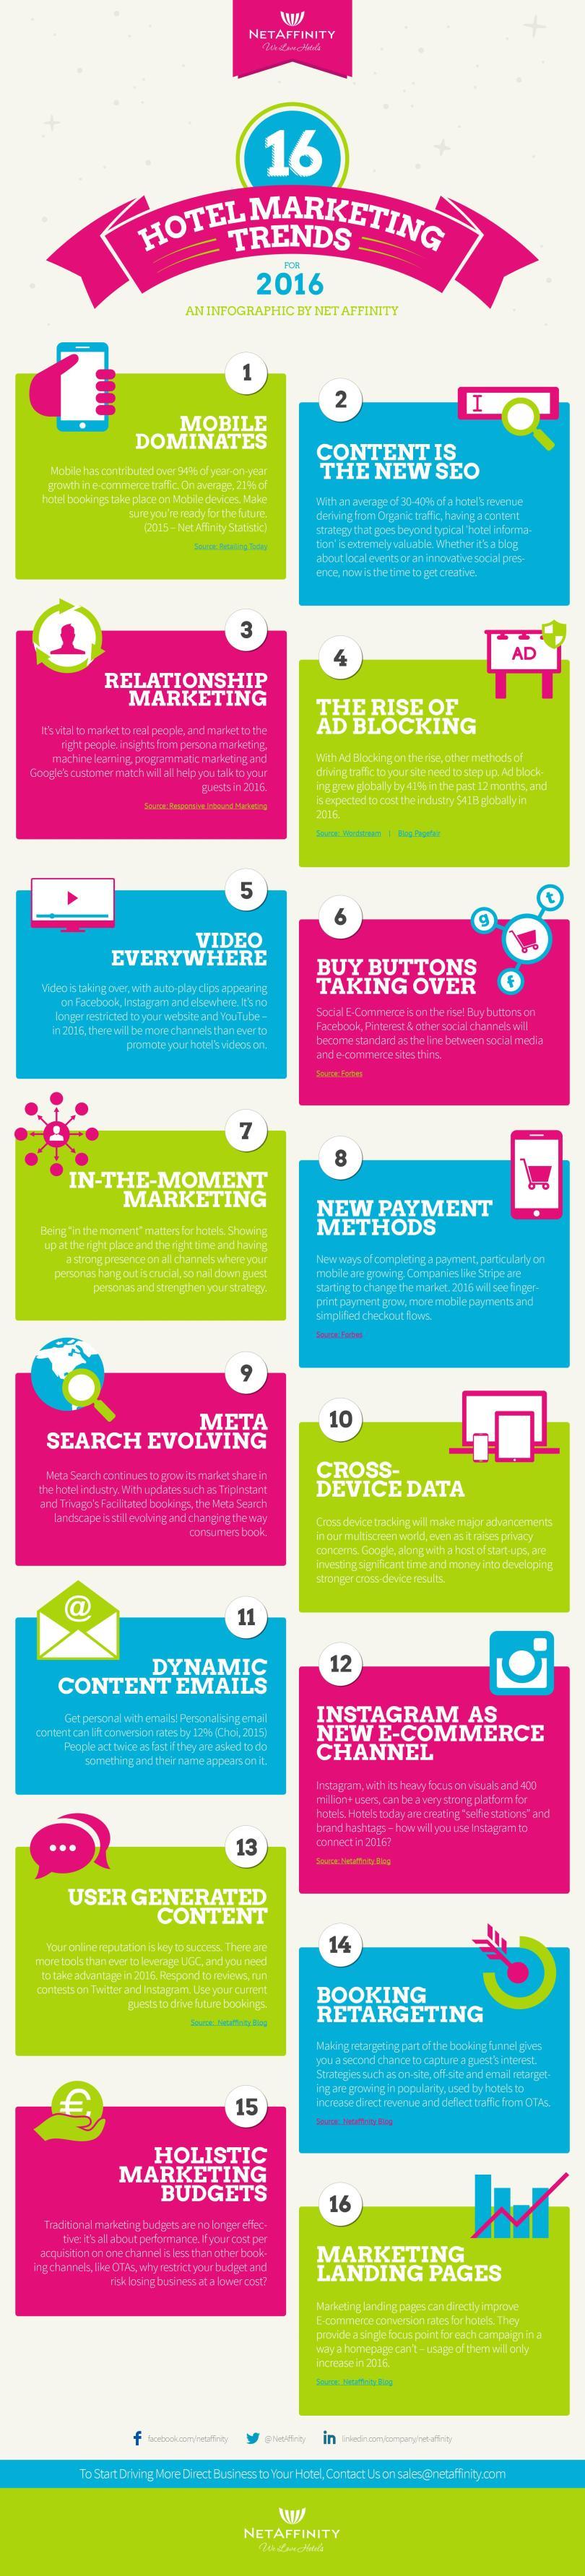 16-hotel-marketing-trends-for-2016-netaffinity